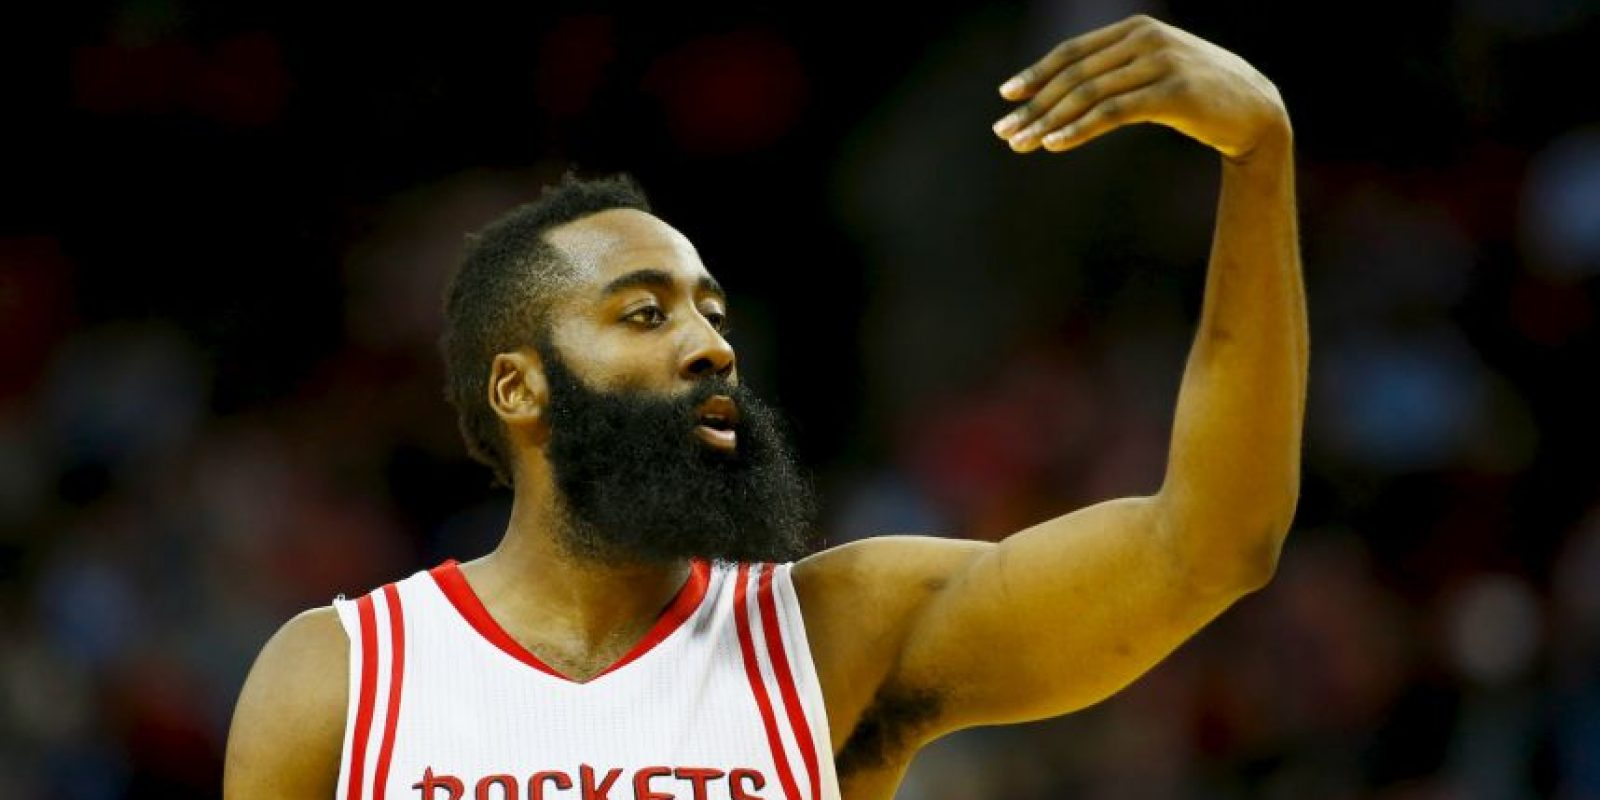 Basquetbolista de Houston Rockets Foto:Getty Images